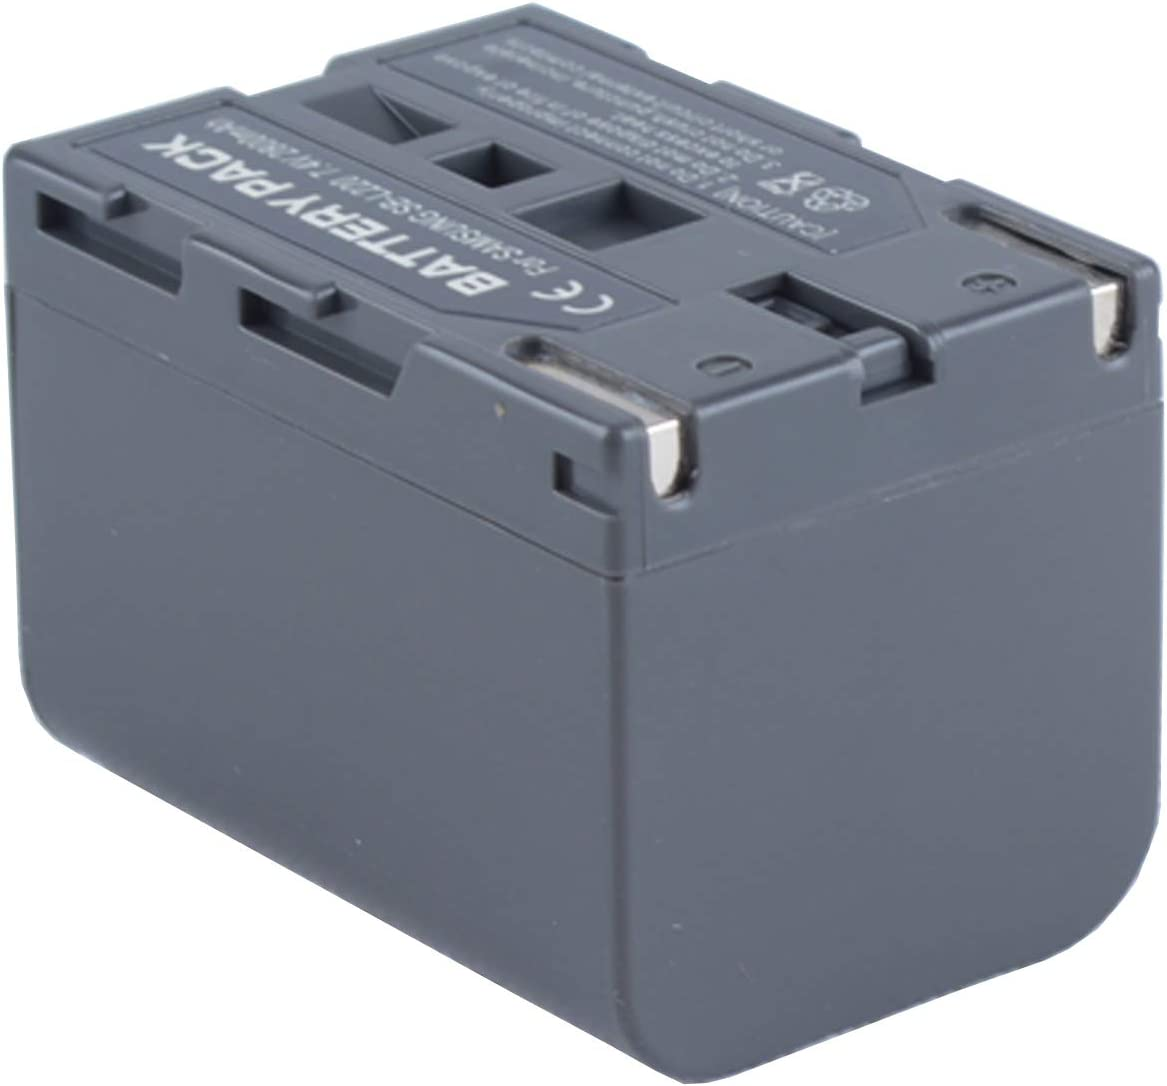 Battery Charger for Samsung SC-D303 SC-D307 Digital Video Camcorder SC-D305